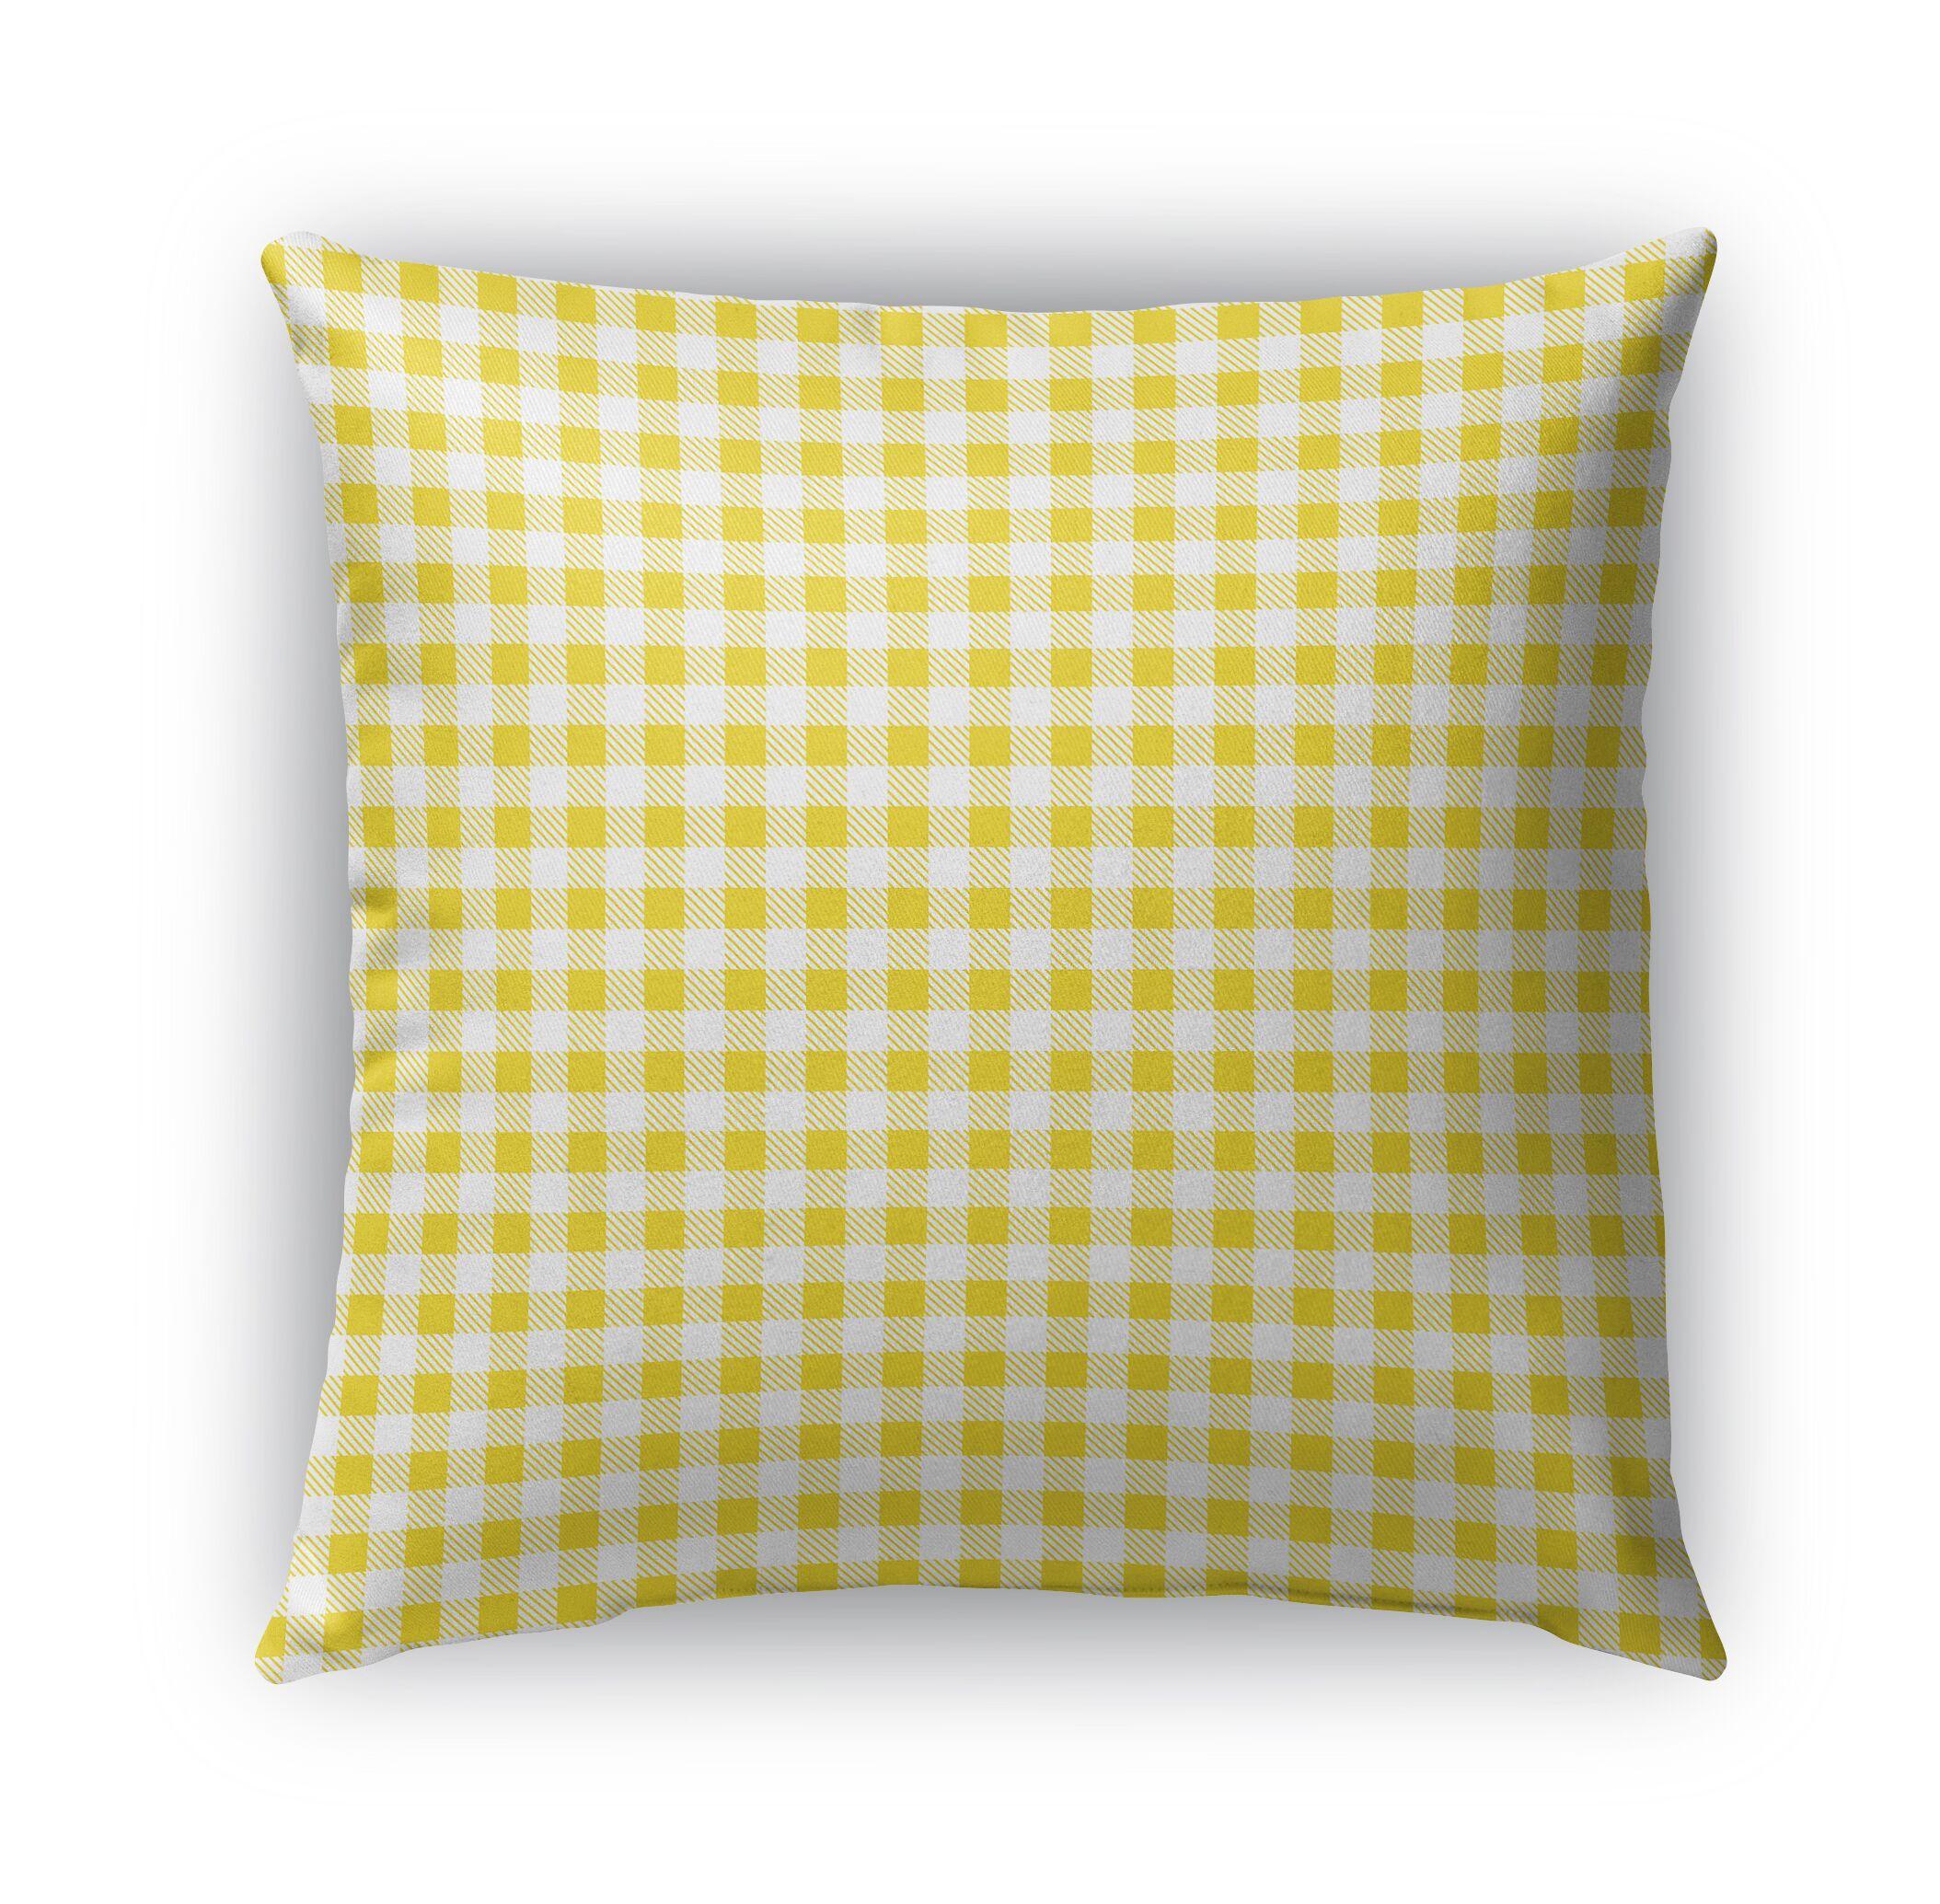 Altha Indoor/Outdoor Euro Pillow